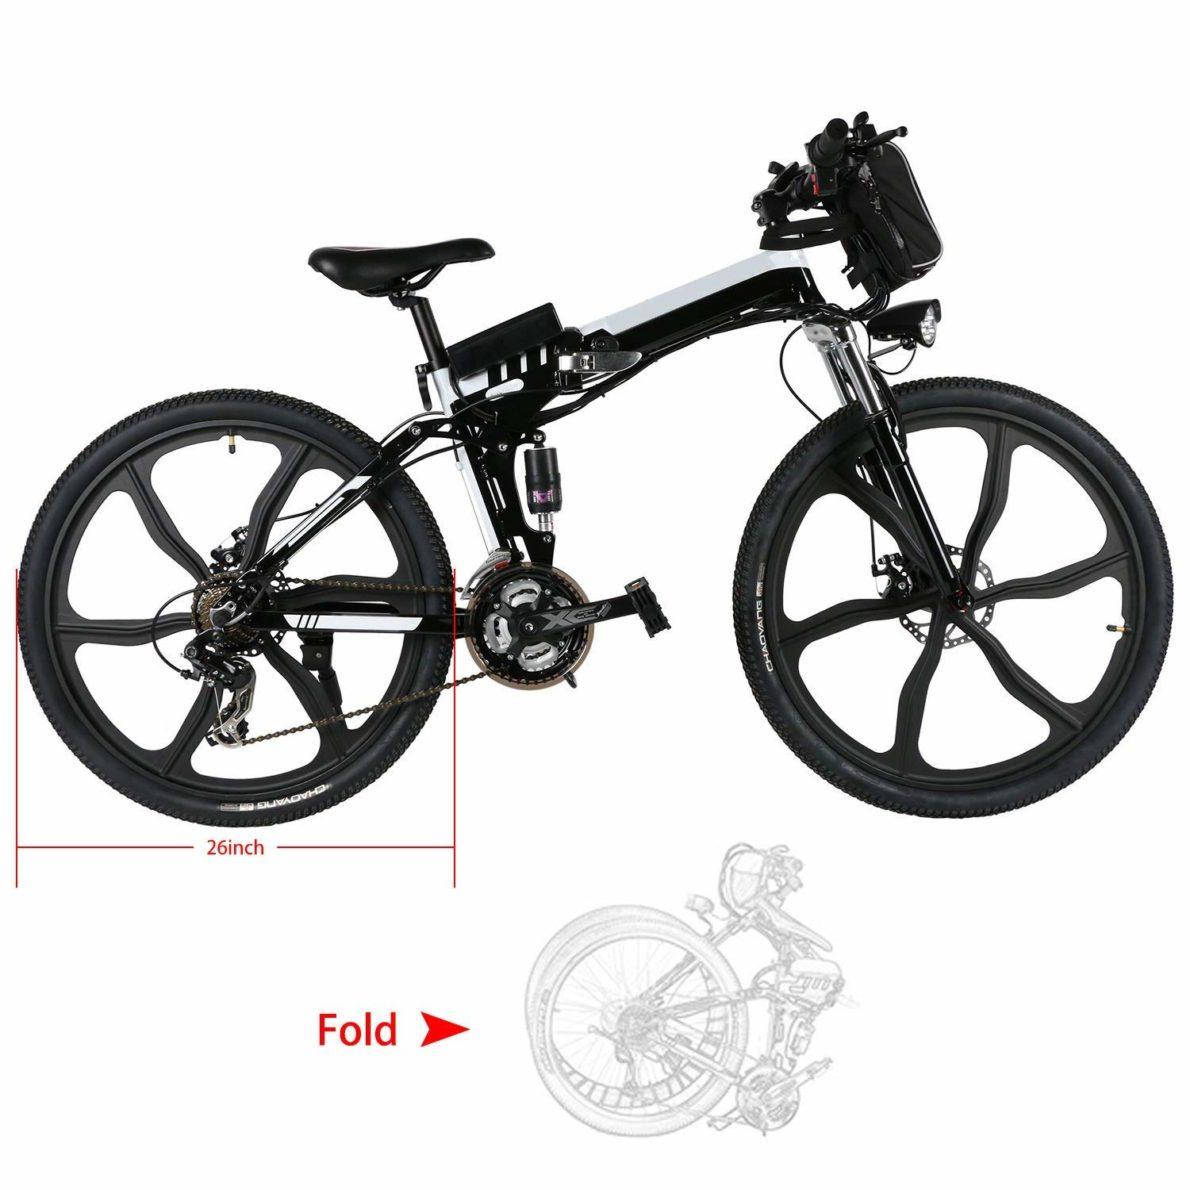 Miageek 26inch Folding E Bike Electric Mountain Bike with Large Capacity Lithium-Ion Battery